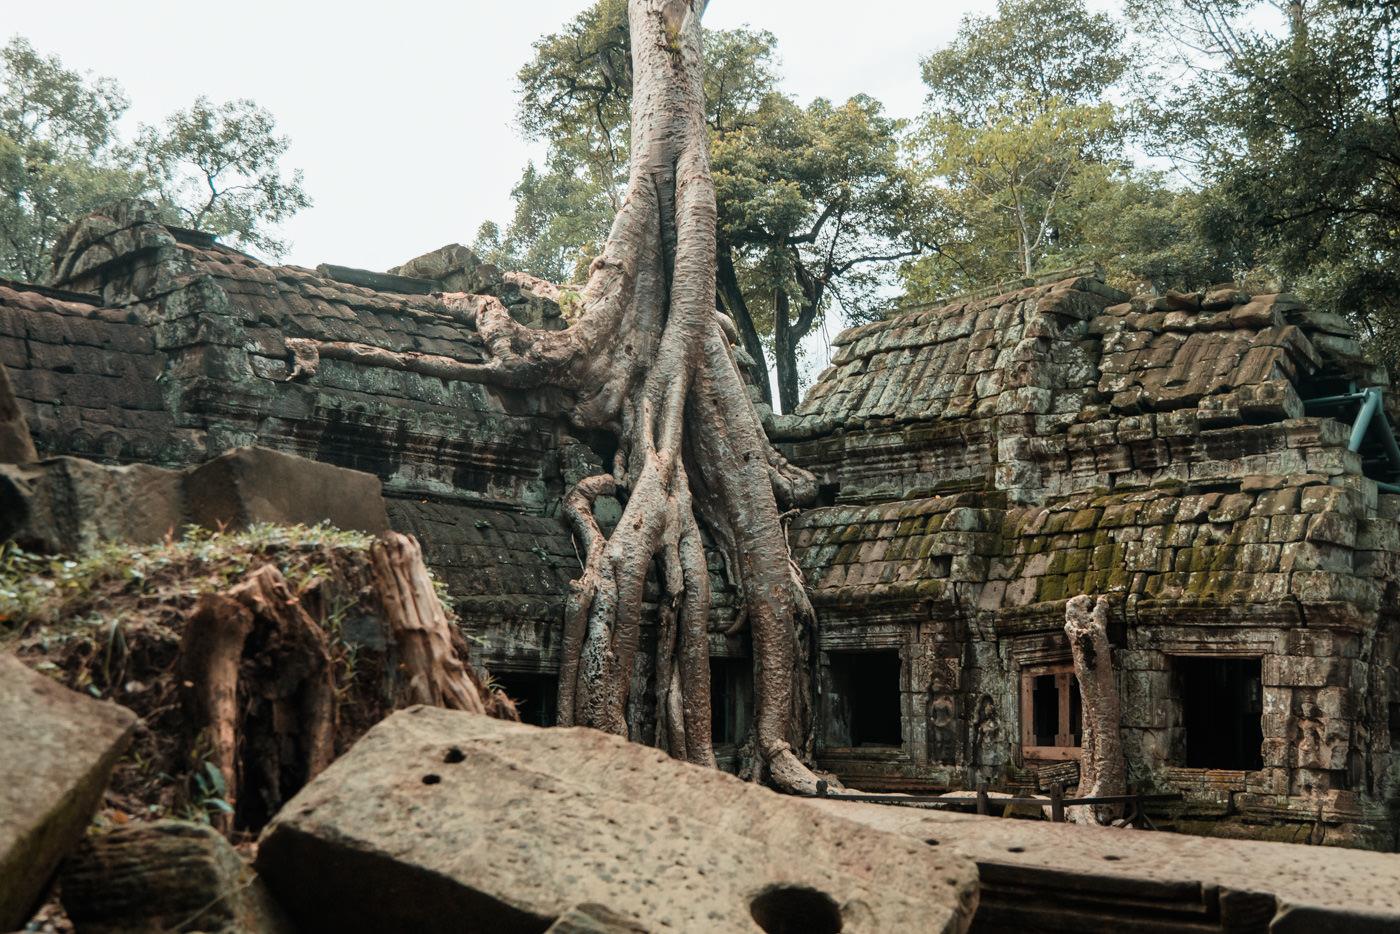 Baum im Ta Prohm Tempel, Angkor Wat, Kambodscha